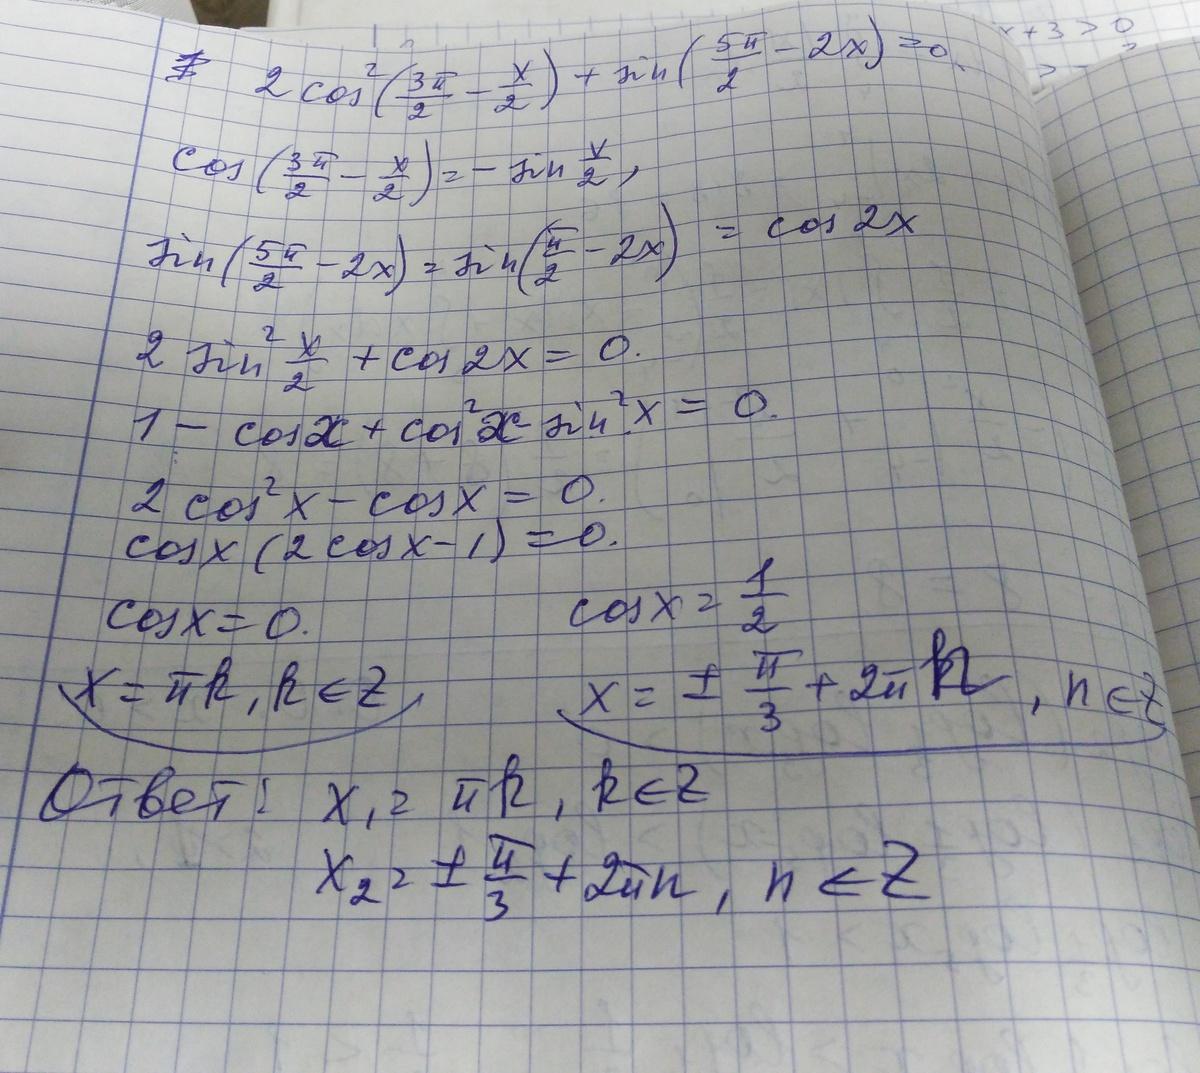 2 cos^2(3pi/2-x/2)+sin(5pi/2-2x)=0 Hellppppp - Школьные ...